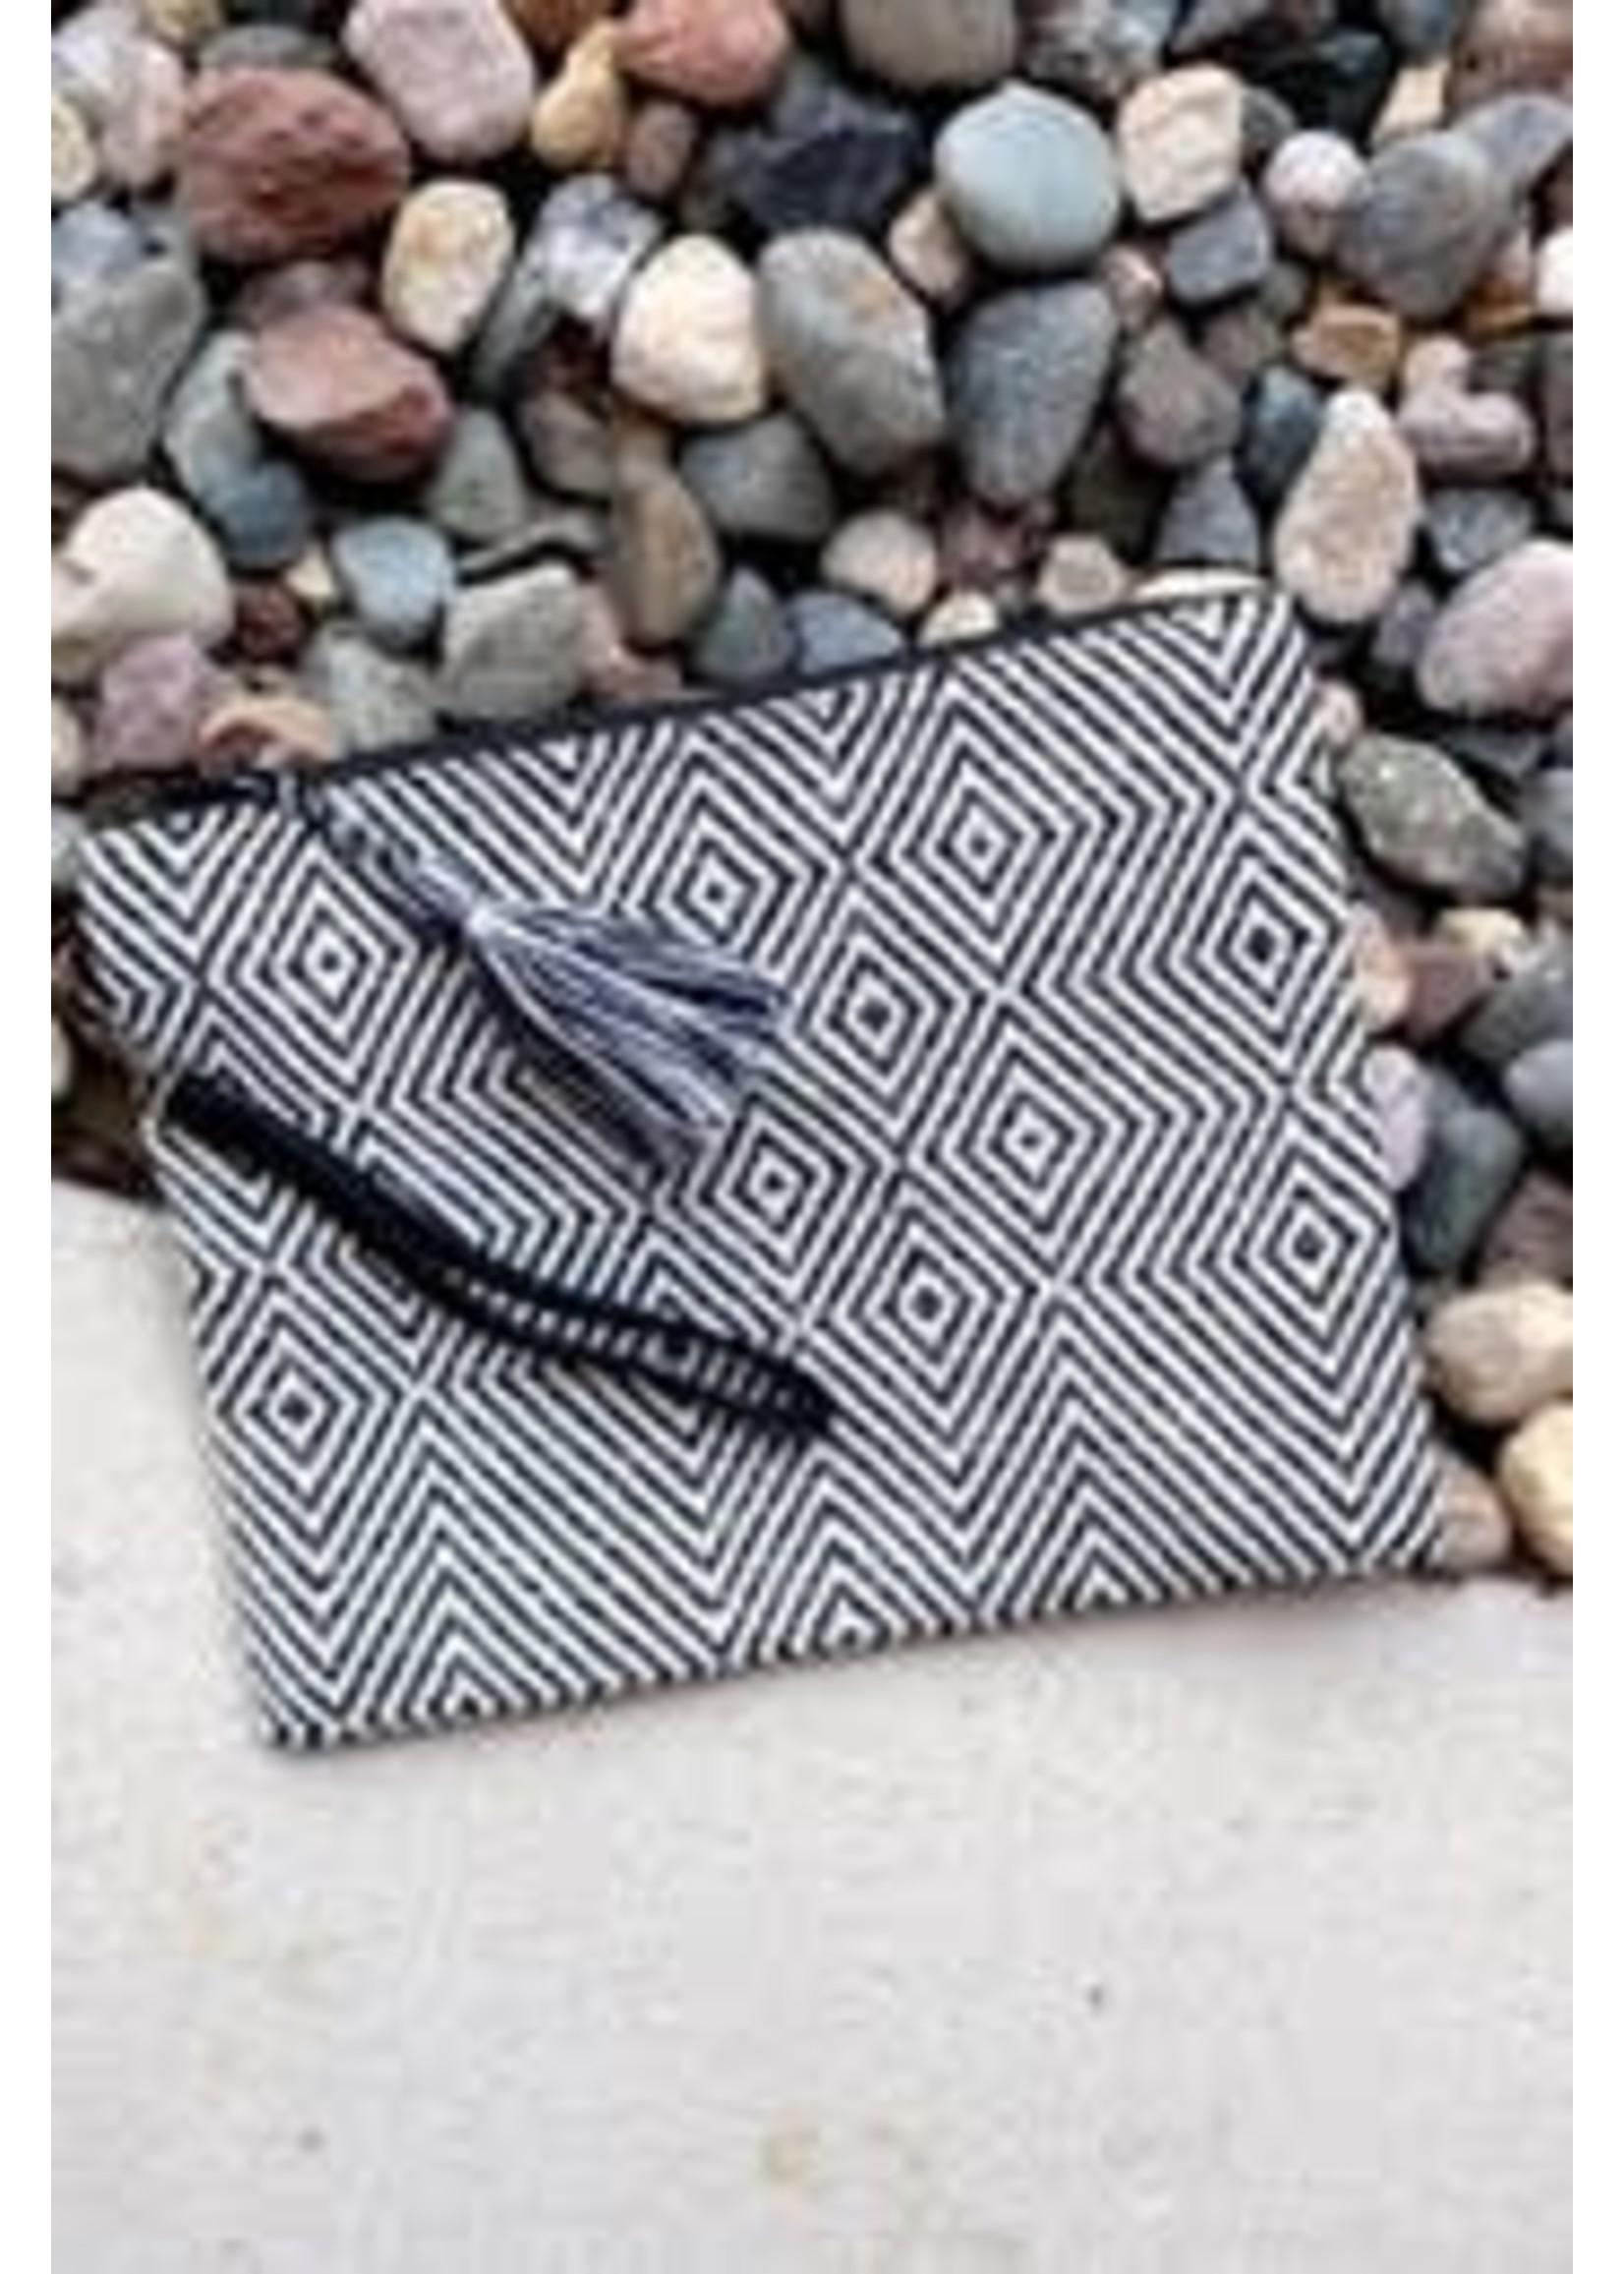 Black & White Woven Purse